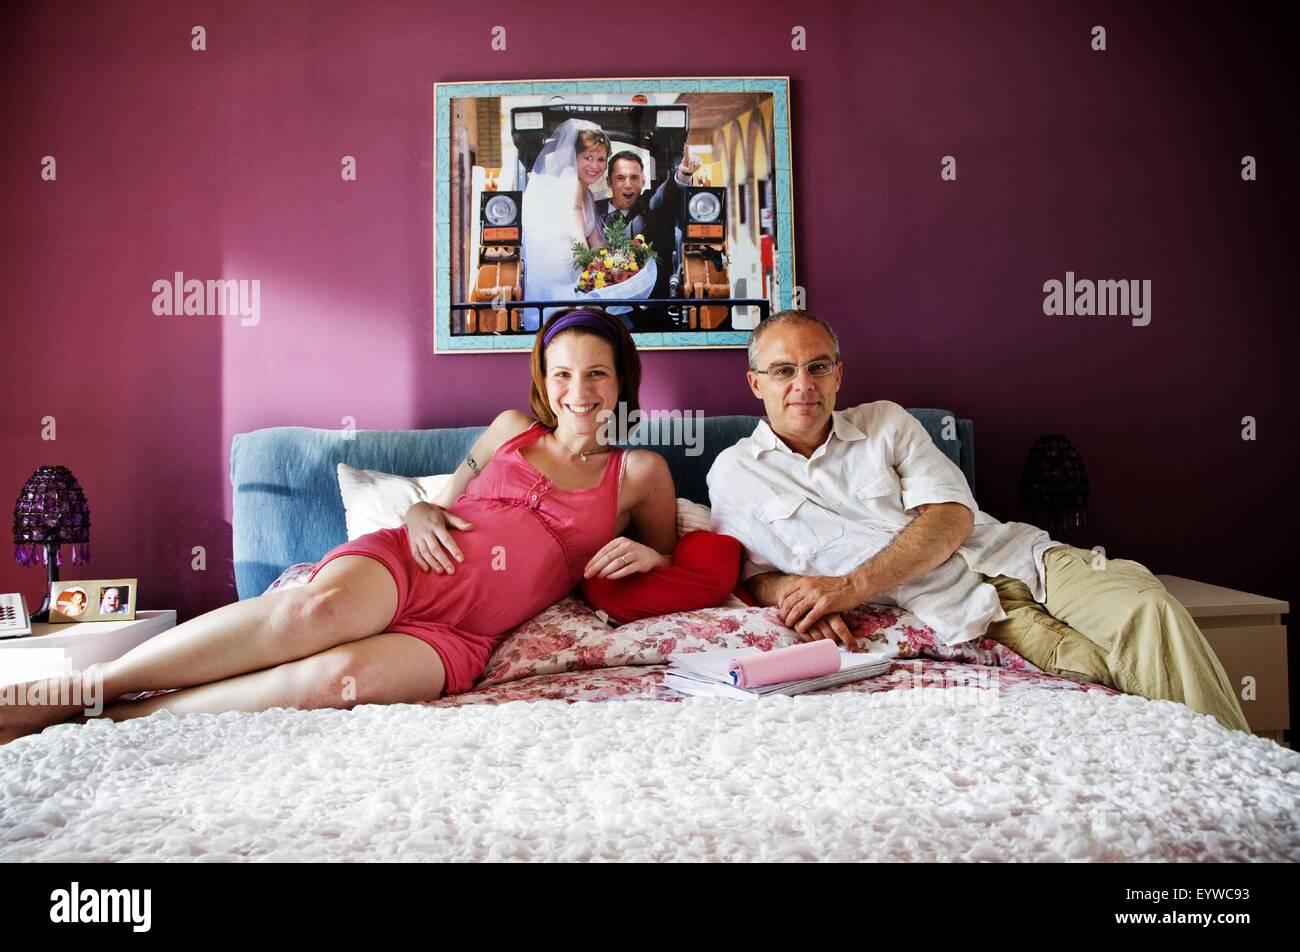 La nostra vita ; Year : 2010 - Italy ; Director : Daniele Luchetti ; Isabella Ragonese, Daniele Luchetti ; Shooting - Stock Image